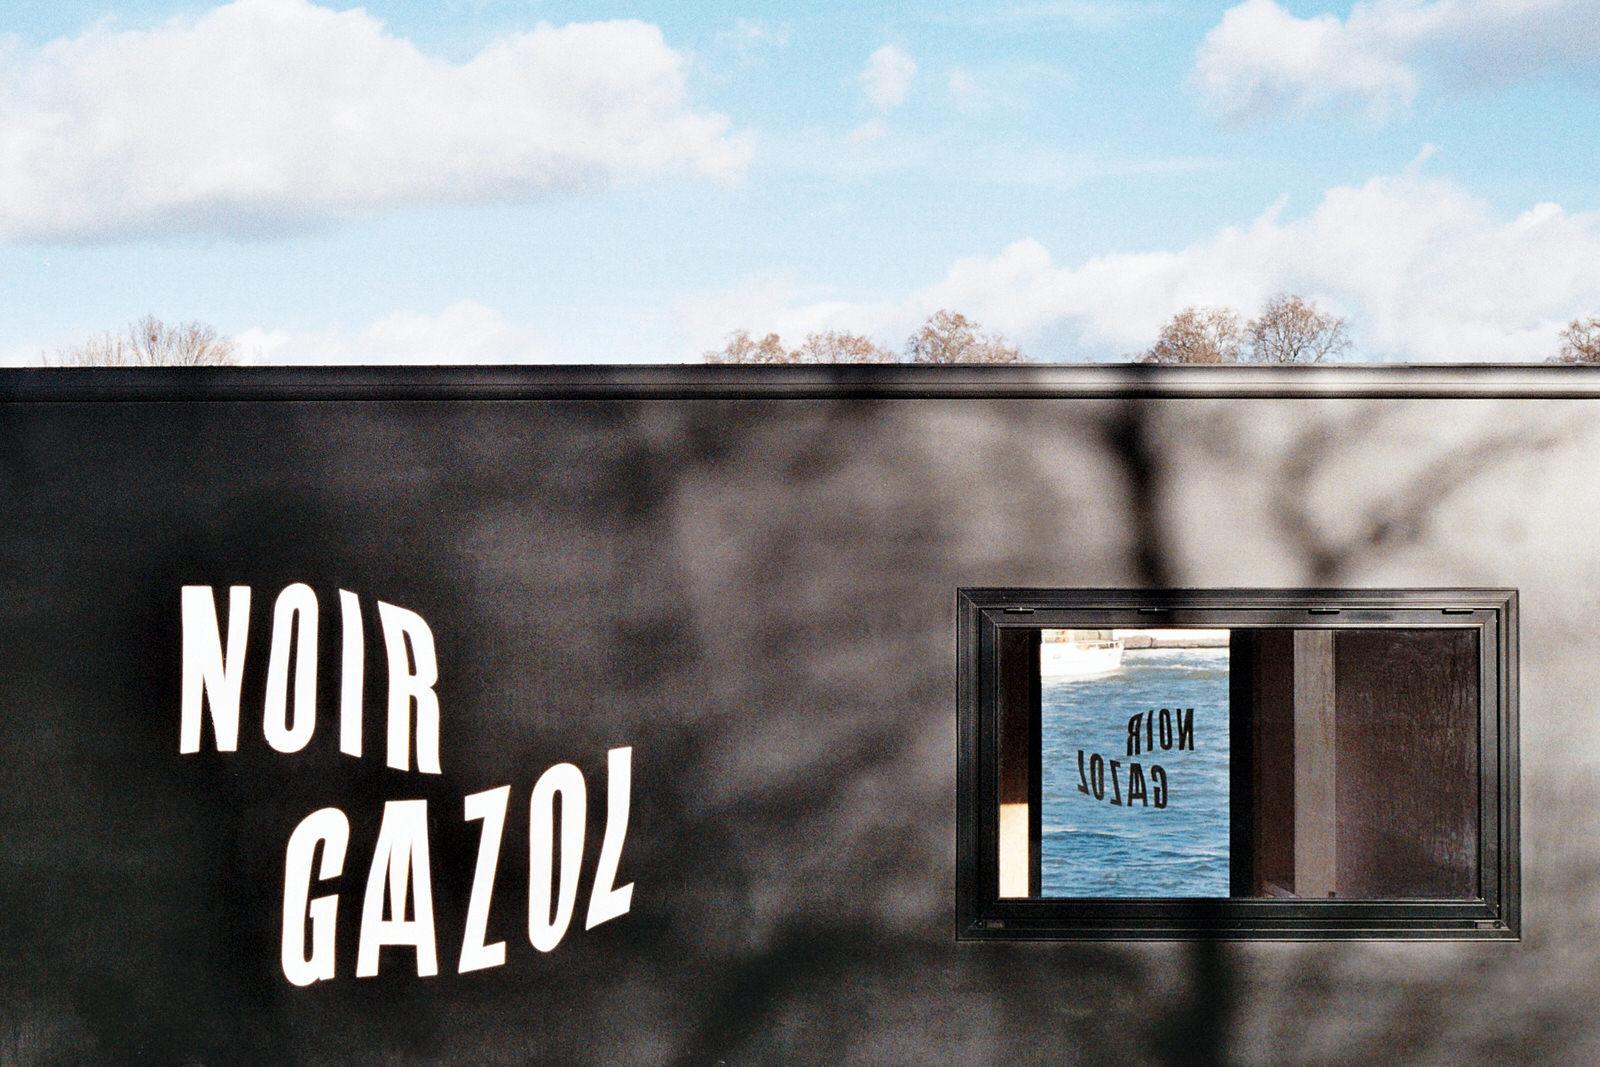 Noir Gaazol